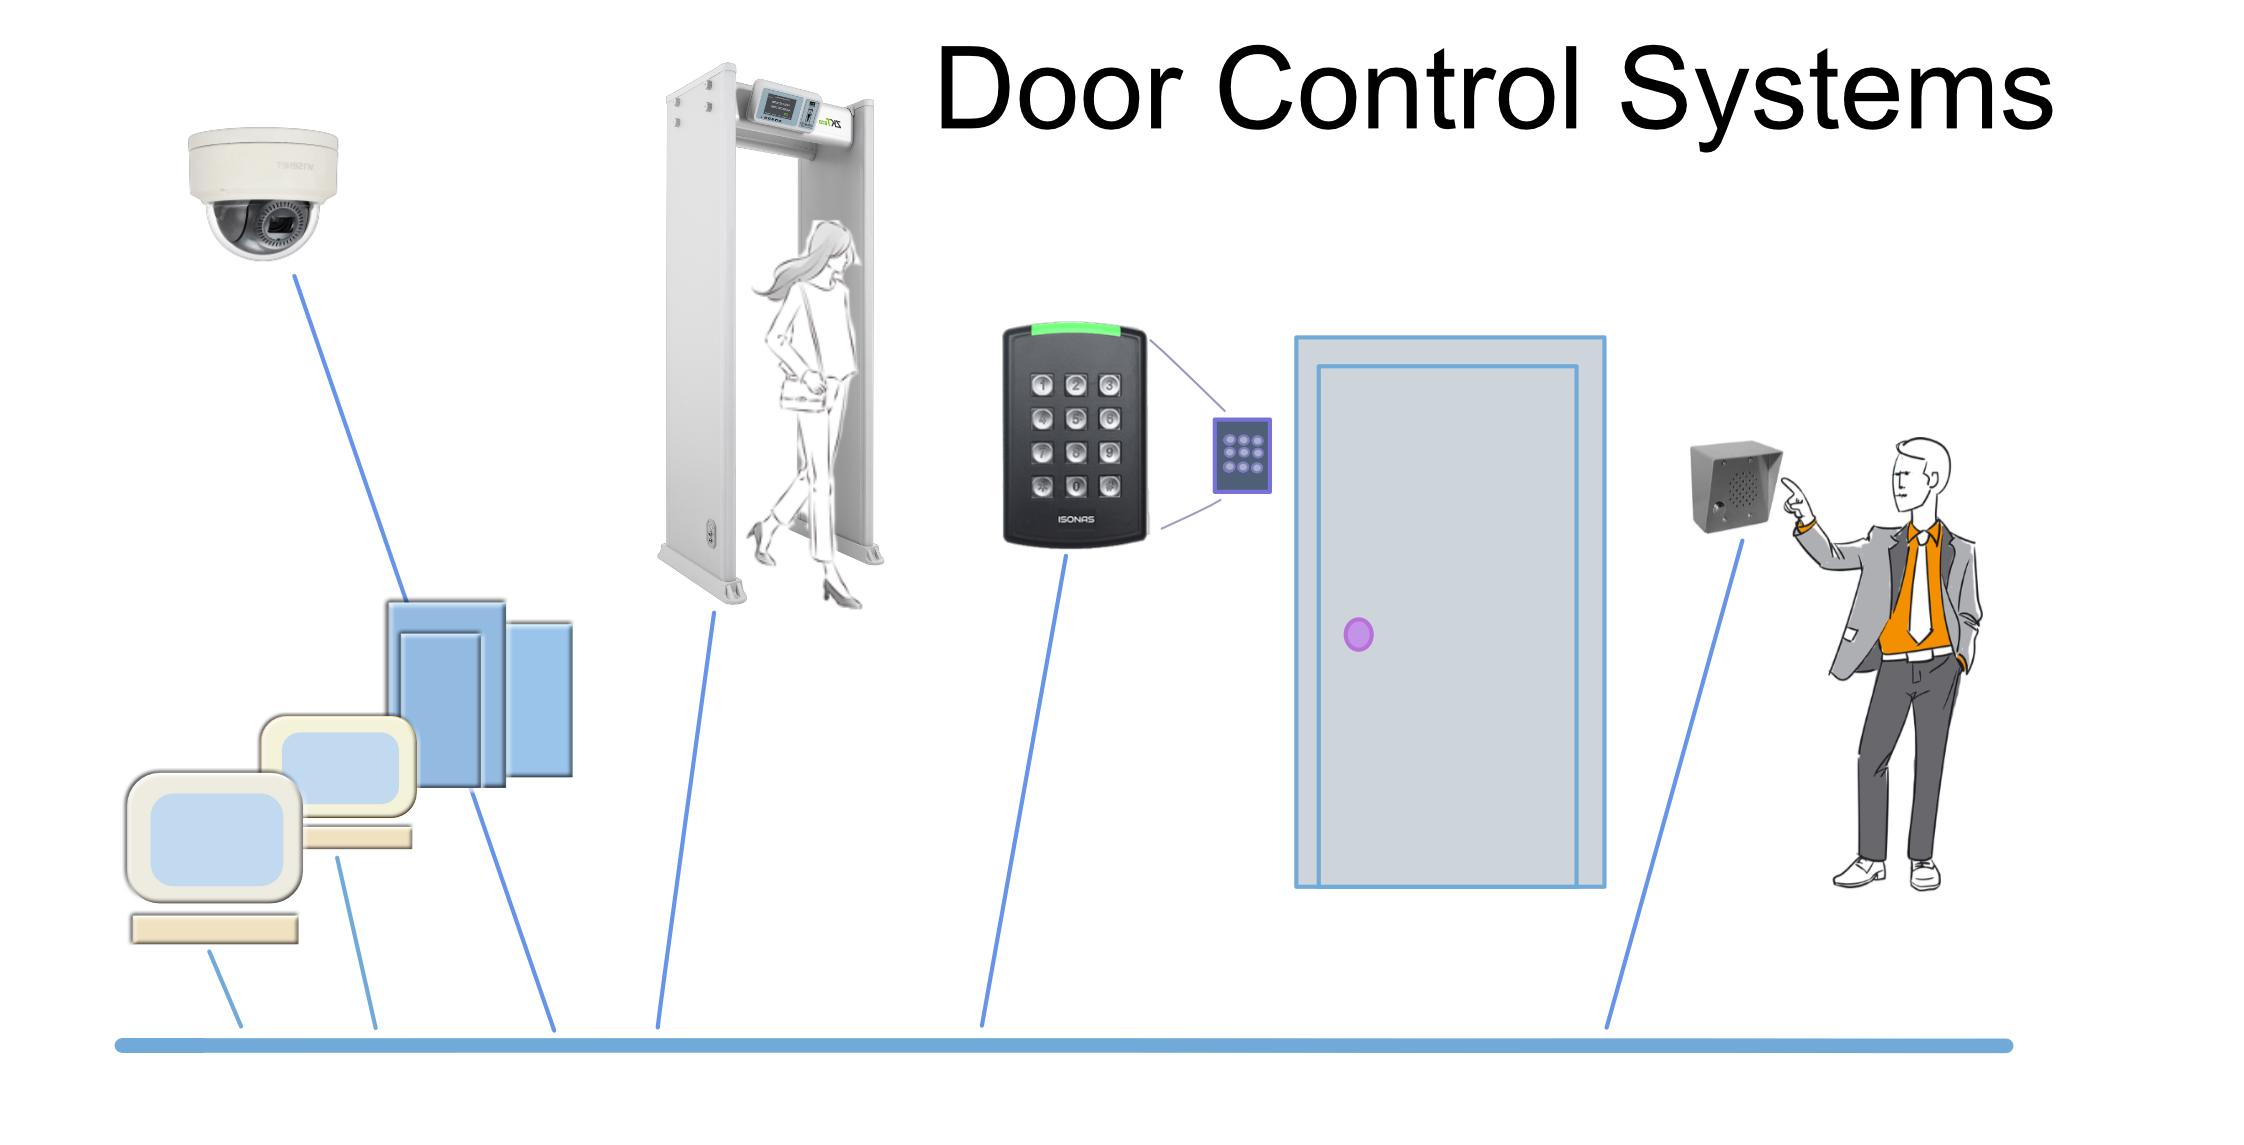 Door Access Control Concept